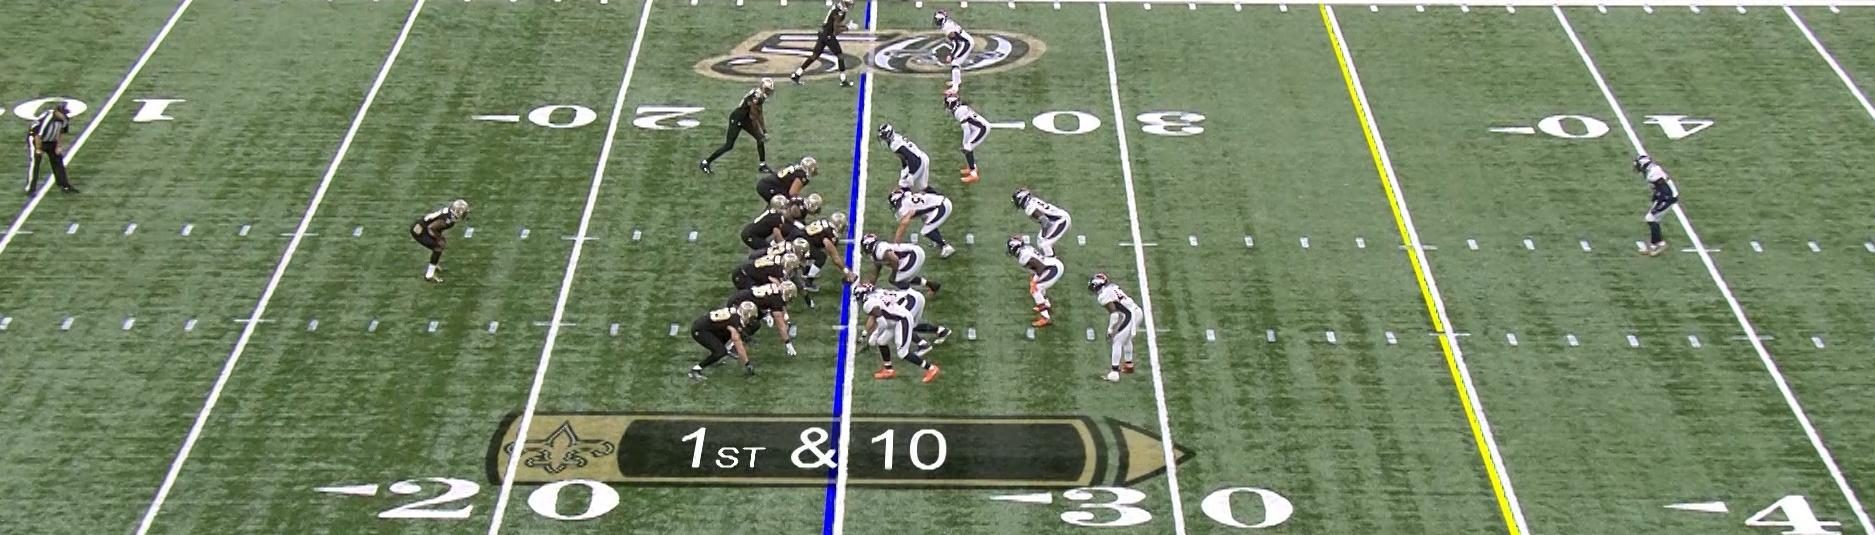 Saints_Virtual 1st_Field_1.jpg